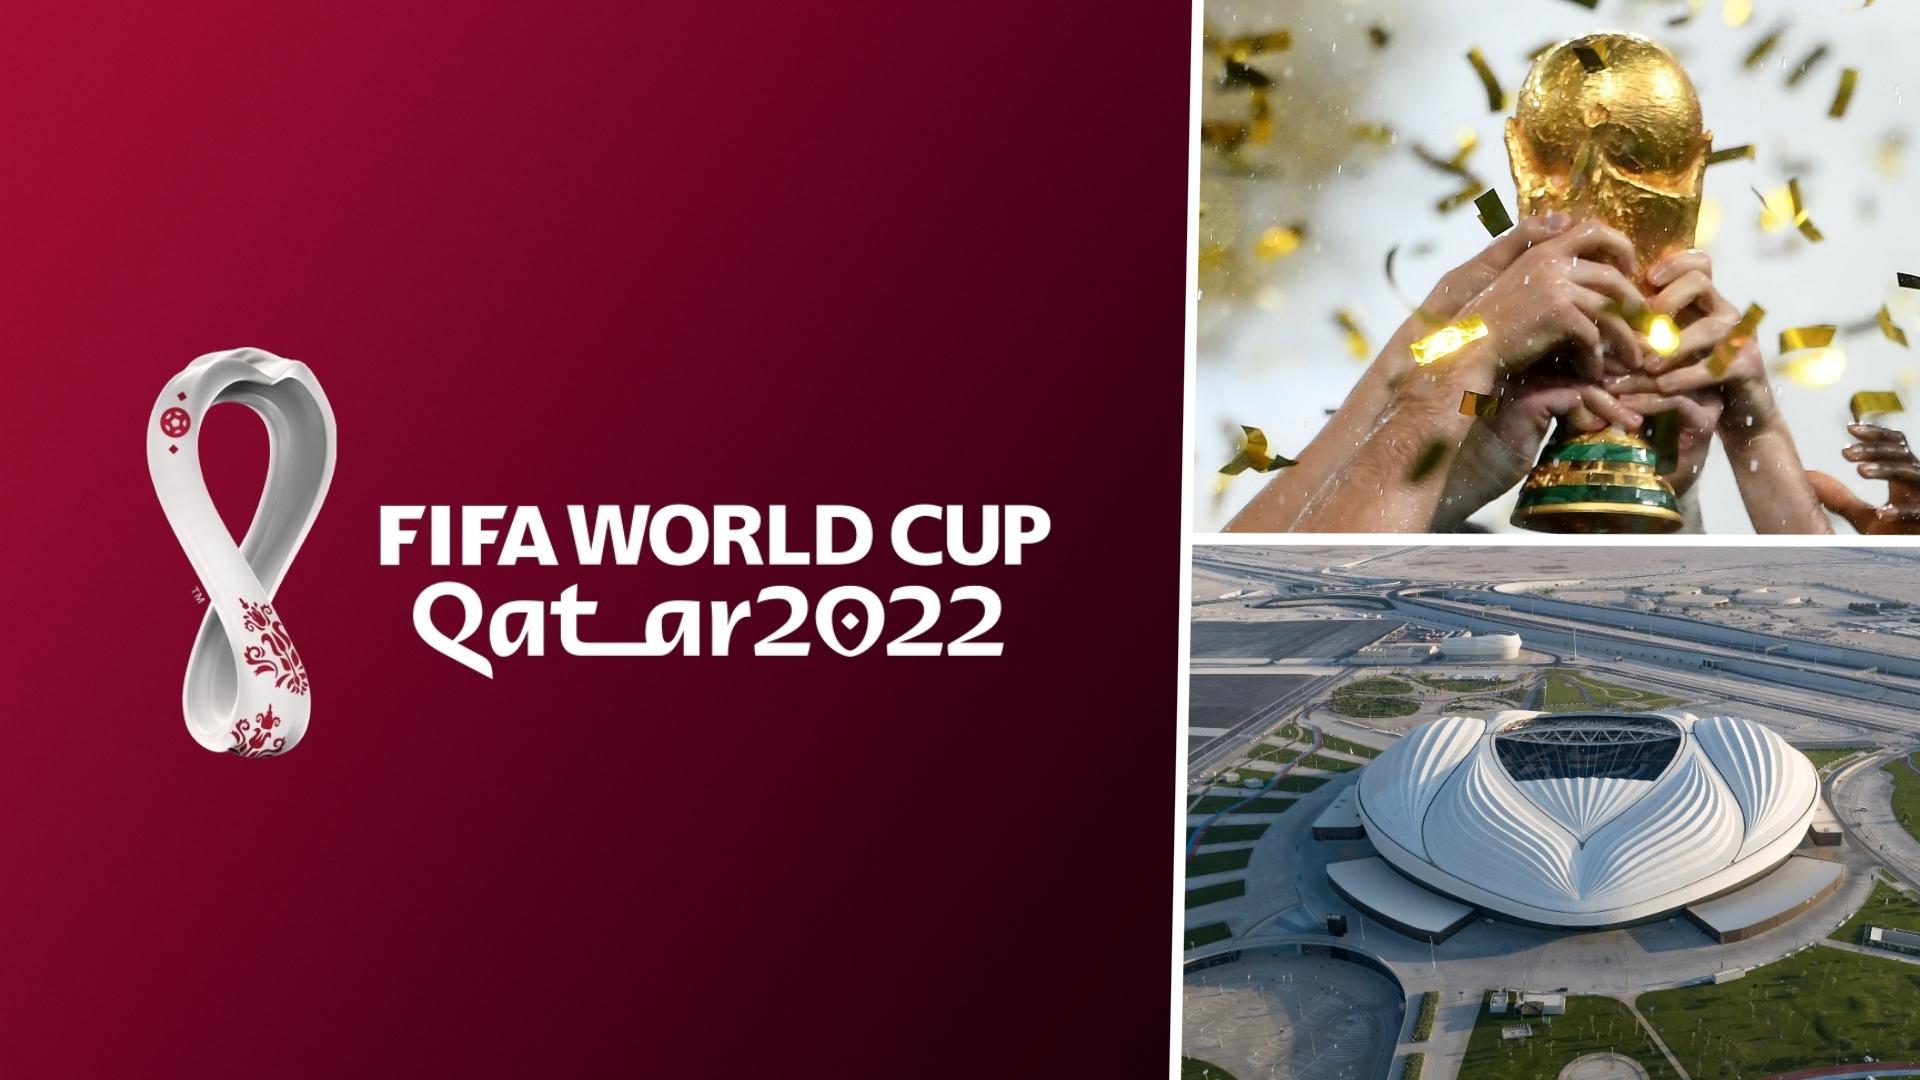 Tanpa Grup Neraka Inilah Hasil Undian Kualifikasi Piala Dunia 2022 Zona Eropa Goal Com